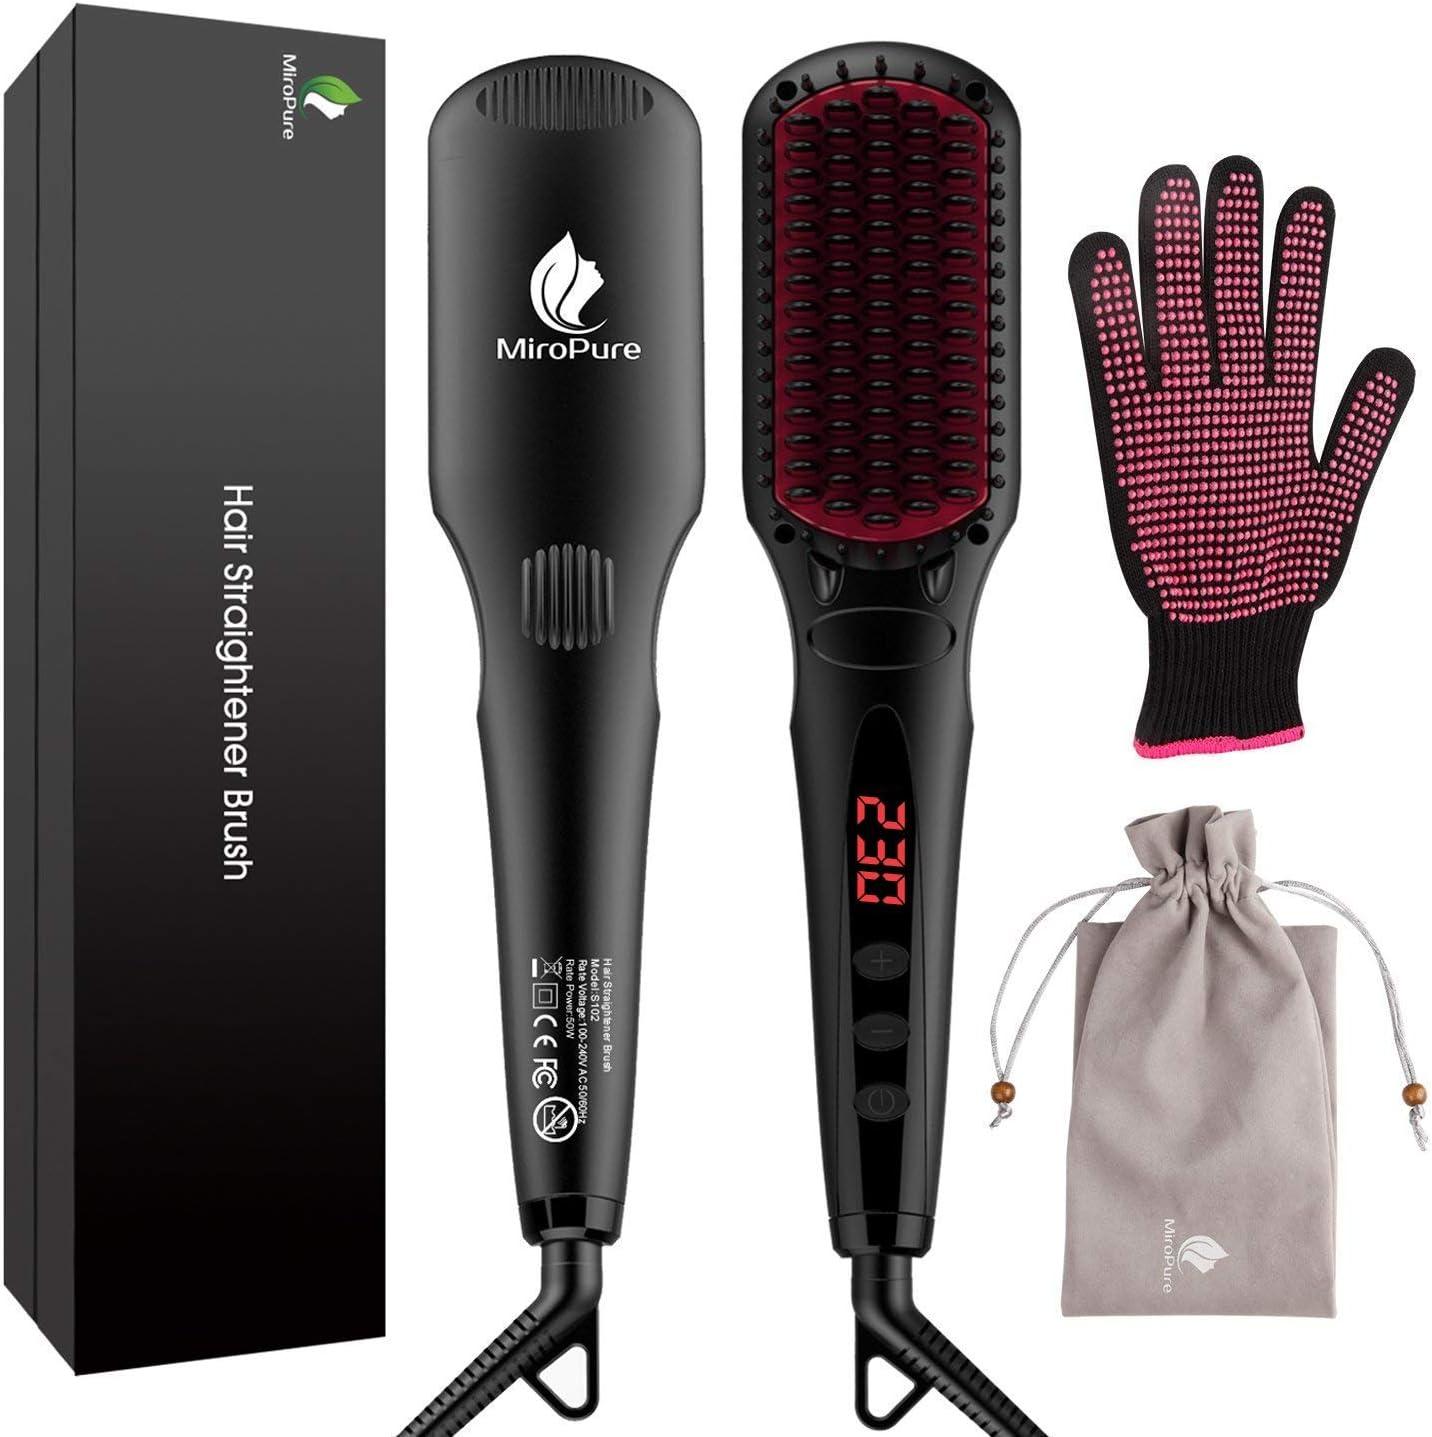 MiroPure Hair Straightening Brush 2 in 1 Ionic Hair Straightener Brush Hot Comb MCH Heating Smoothing Brush with Heat Resistant Glove and Temperature